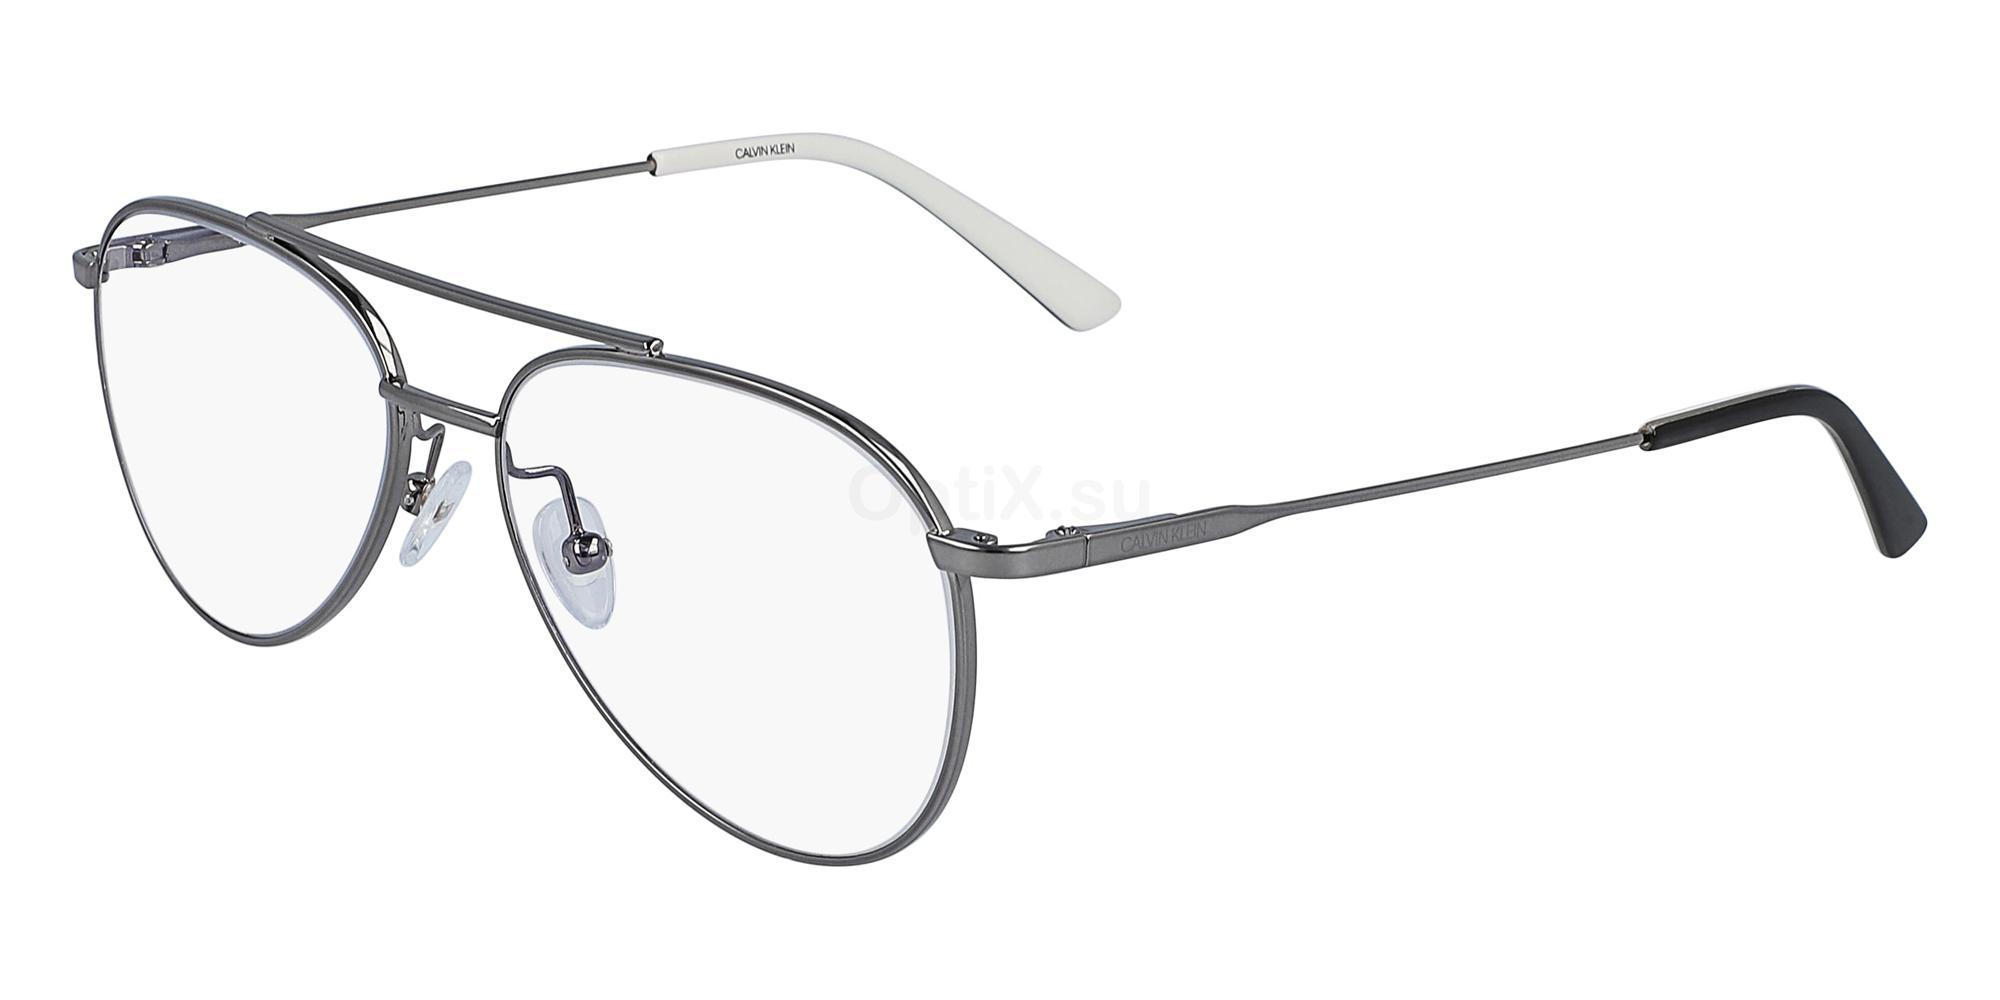 008 CK19112 Glasses, Calvin Klein